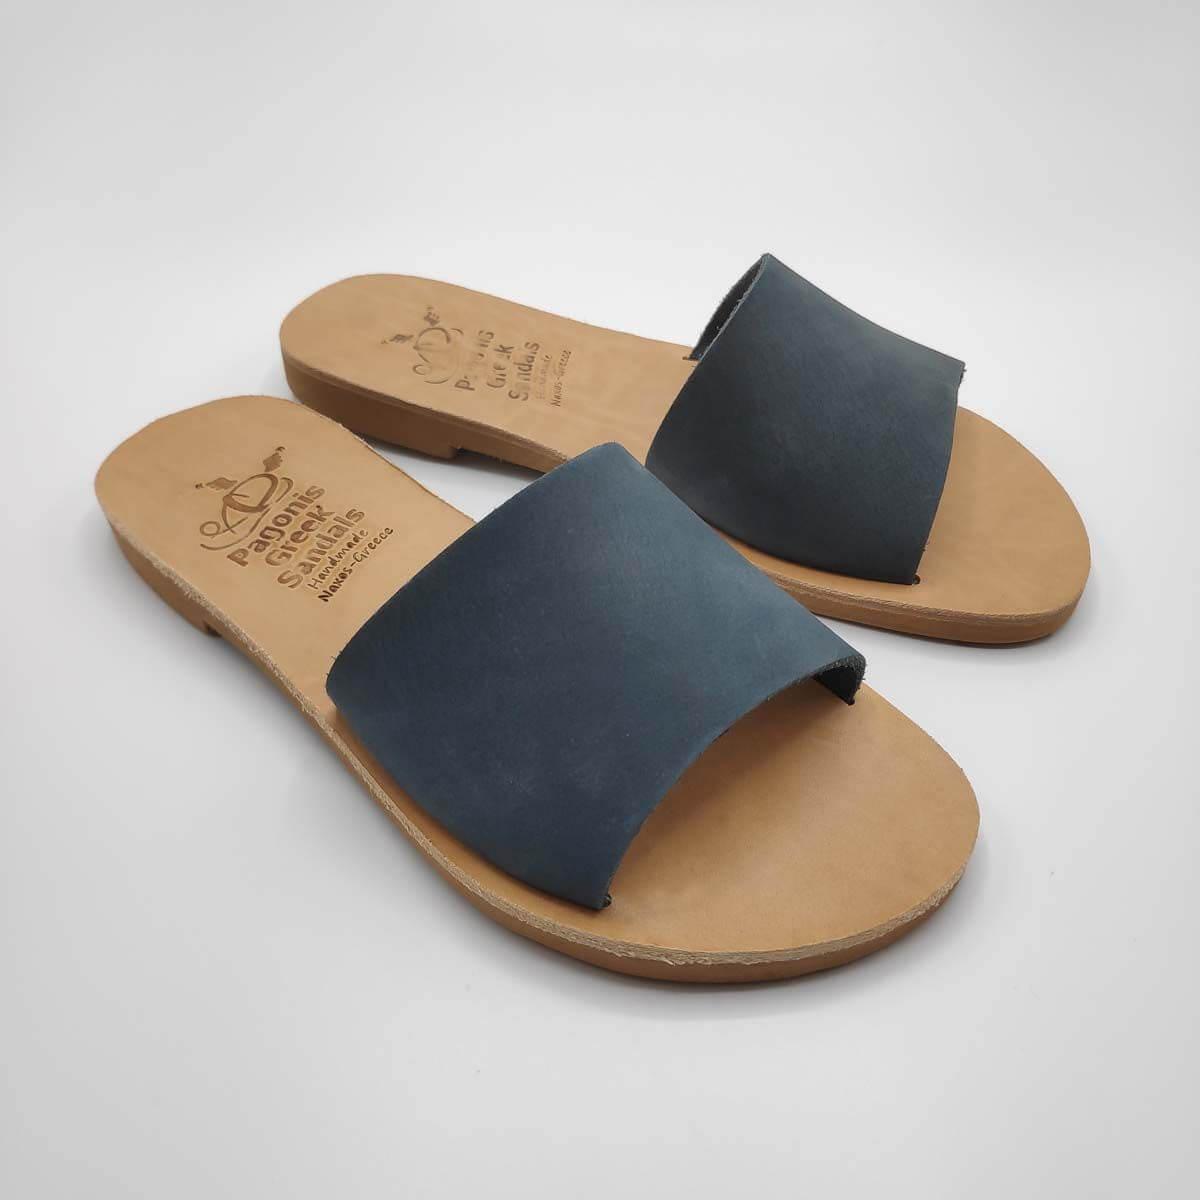 Demosthenes slides for women | Pagonis Greek Sandals